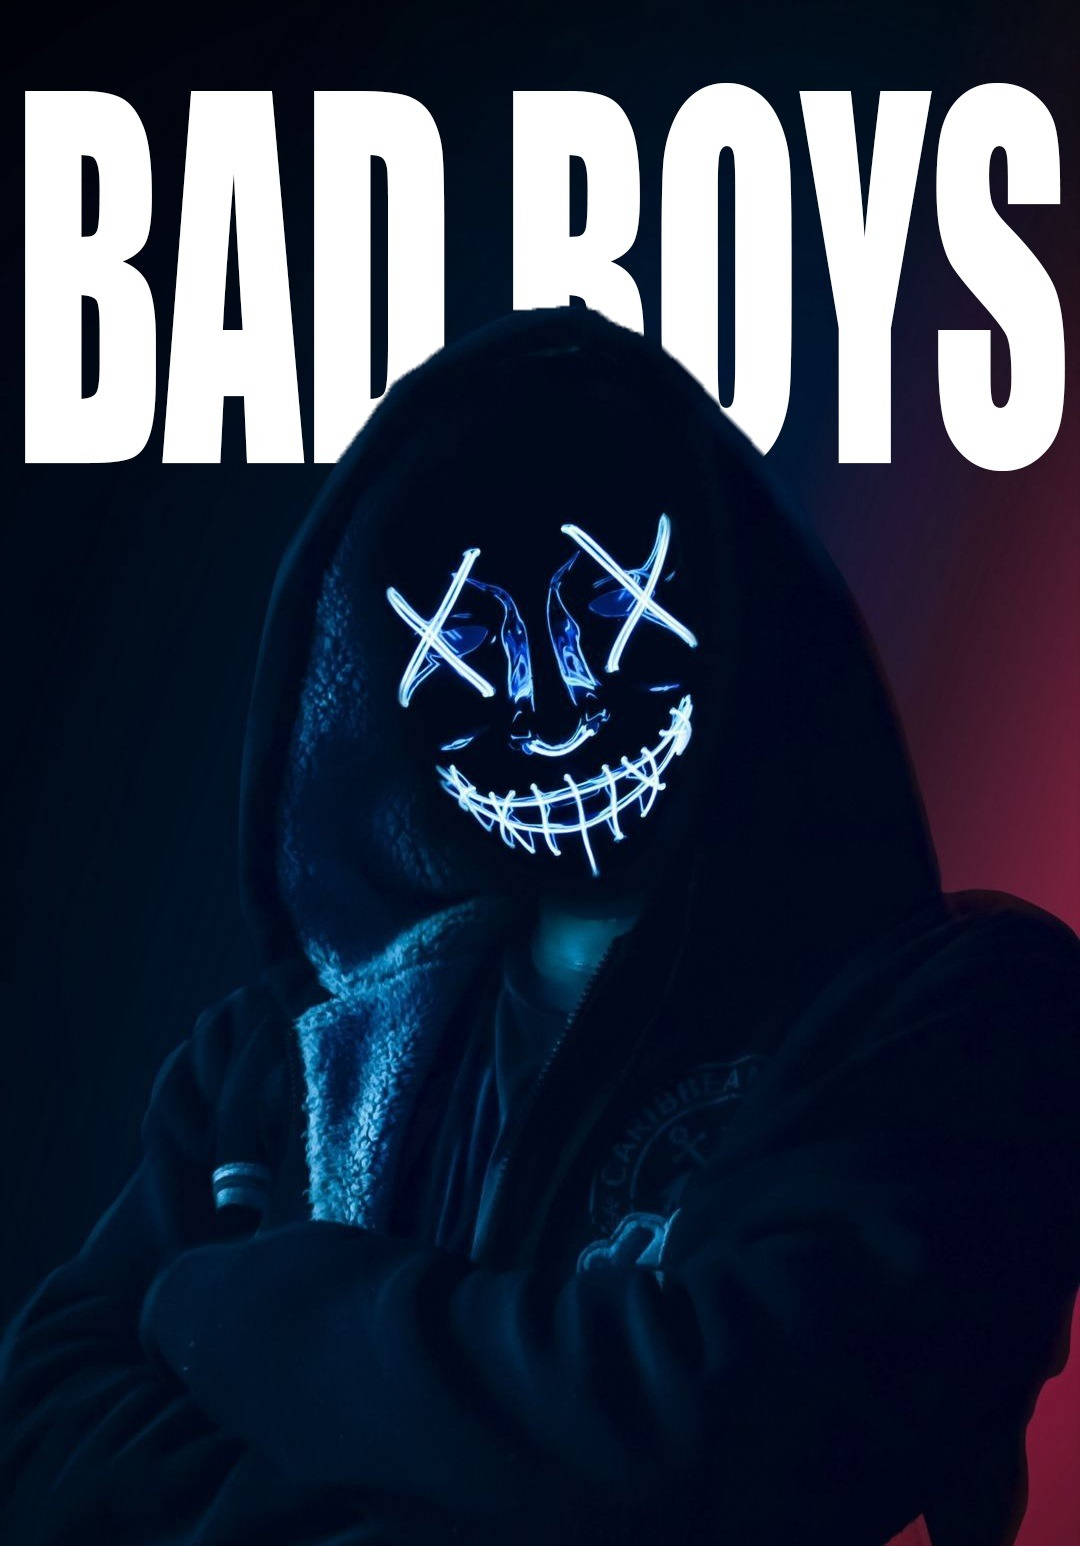 Anime Bad Boy Wallpaper Bad Boys Images Hd Download 1080x1546 Download Hd Wallpaper Wallpapertip